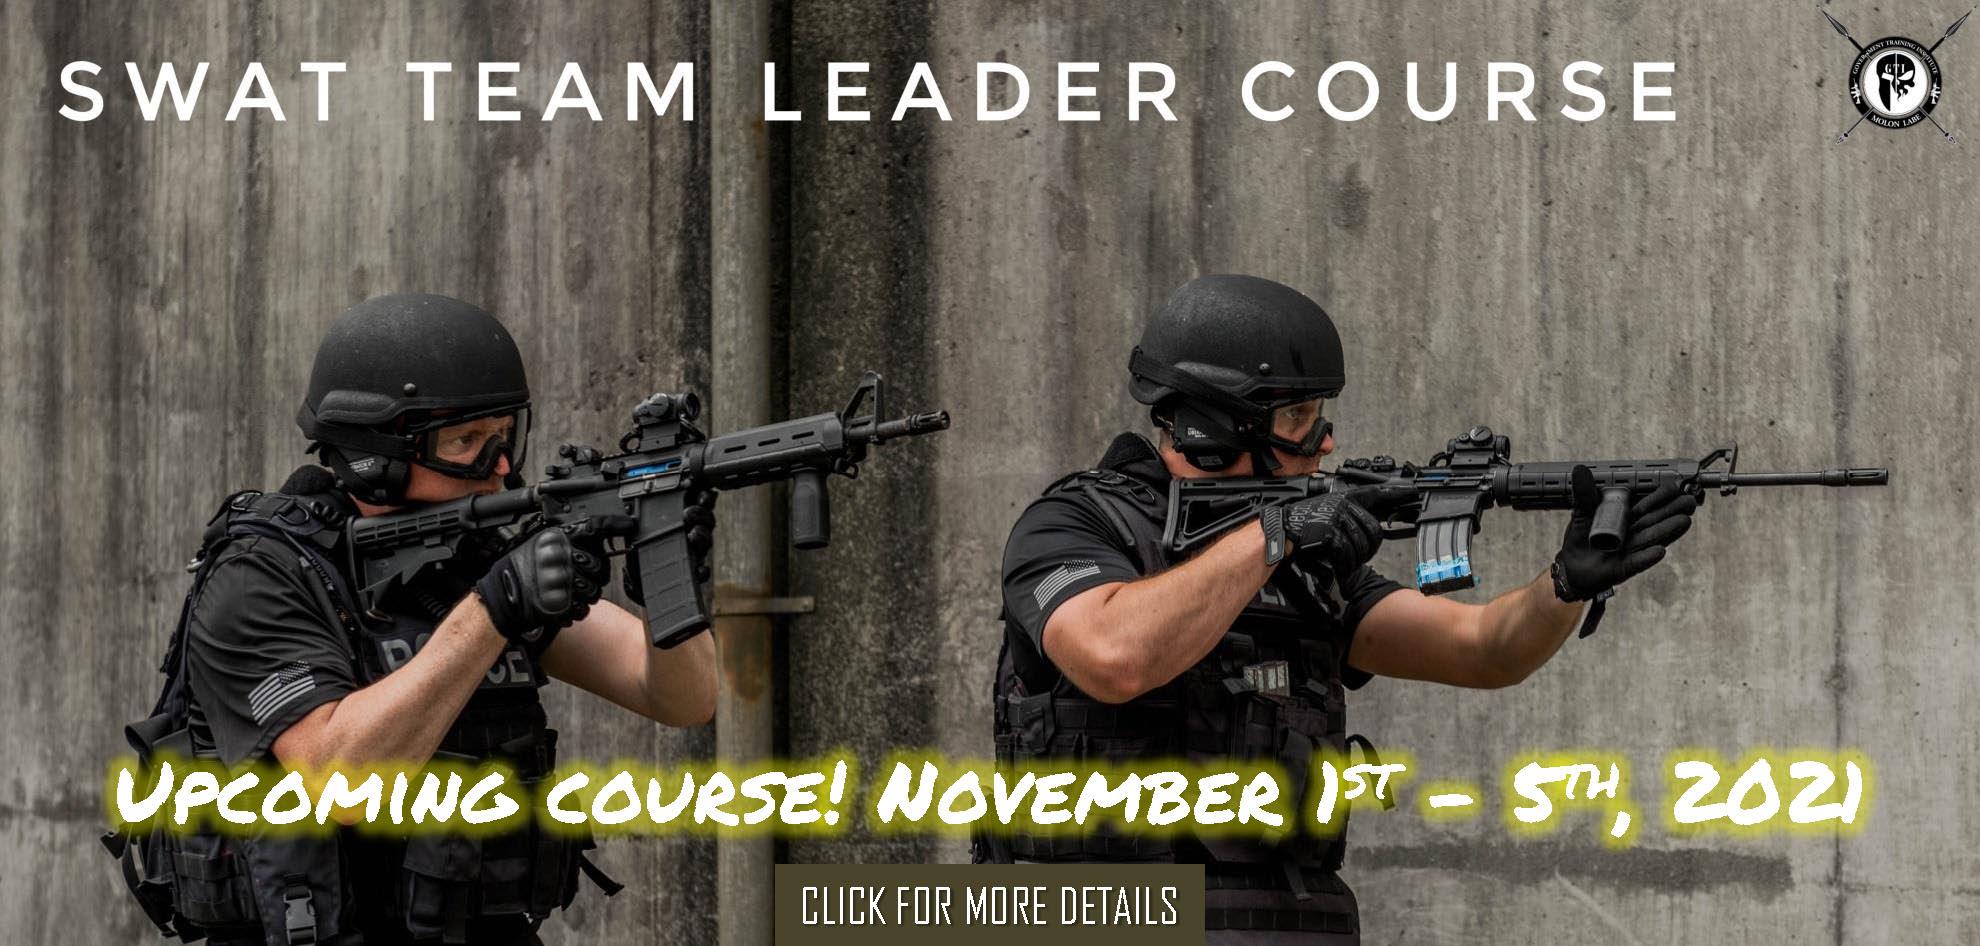 SWAT Team Leader Couse November 1st 5th 2021